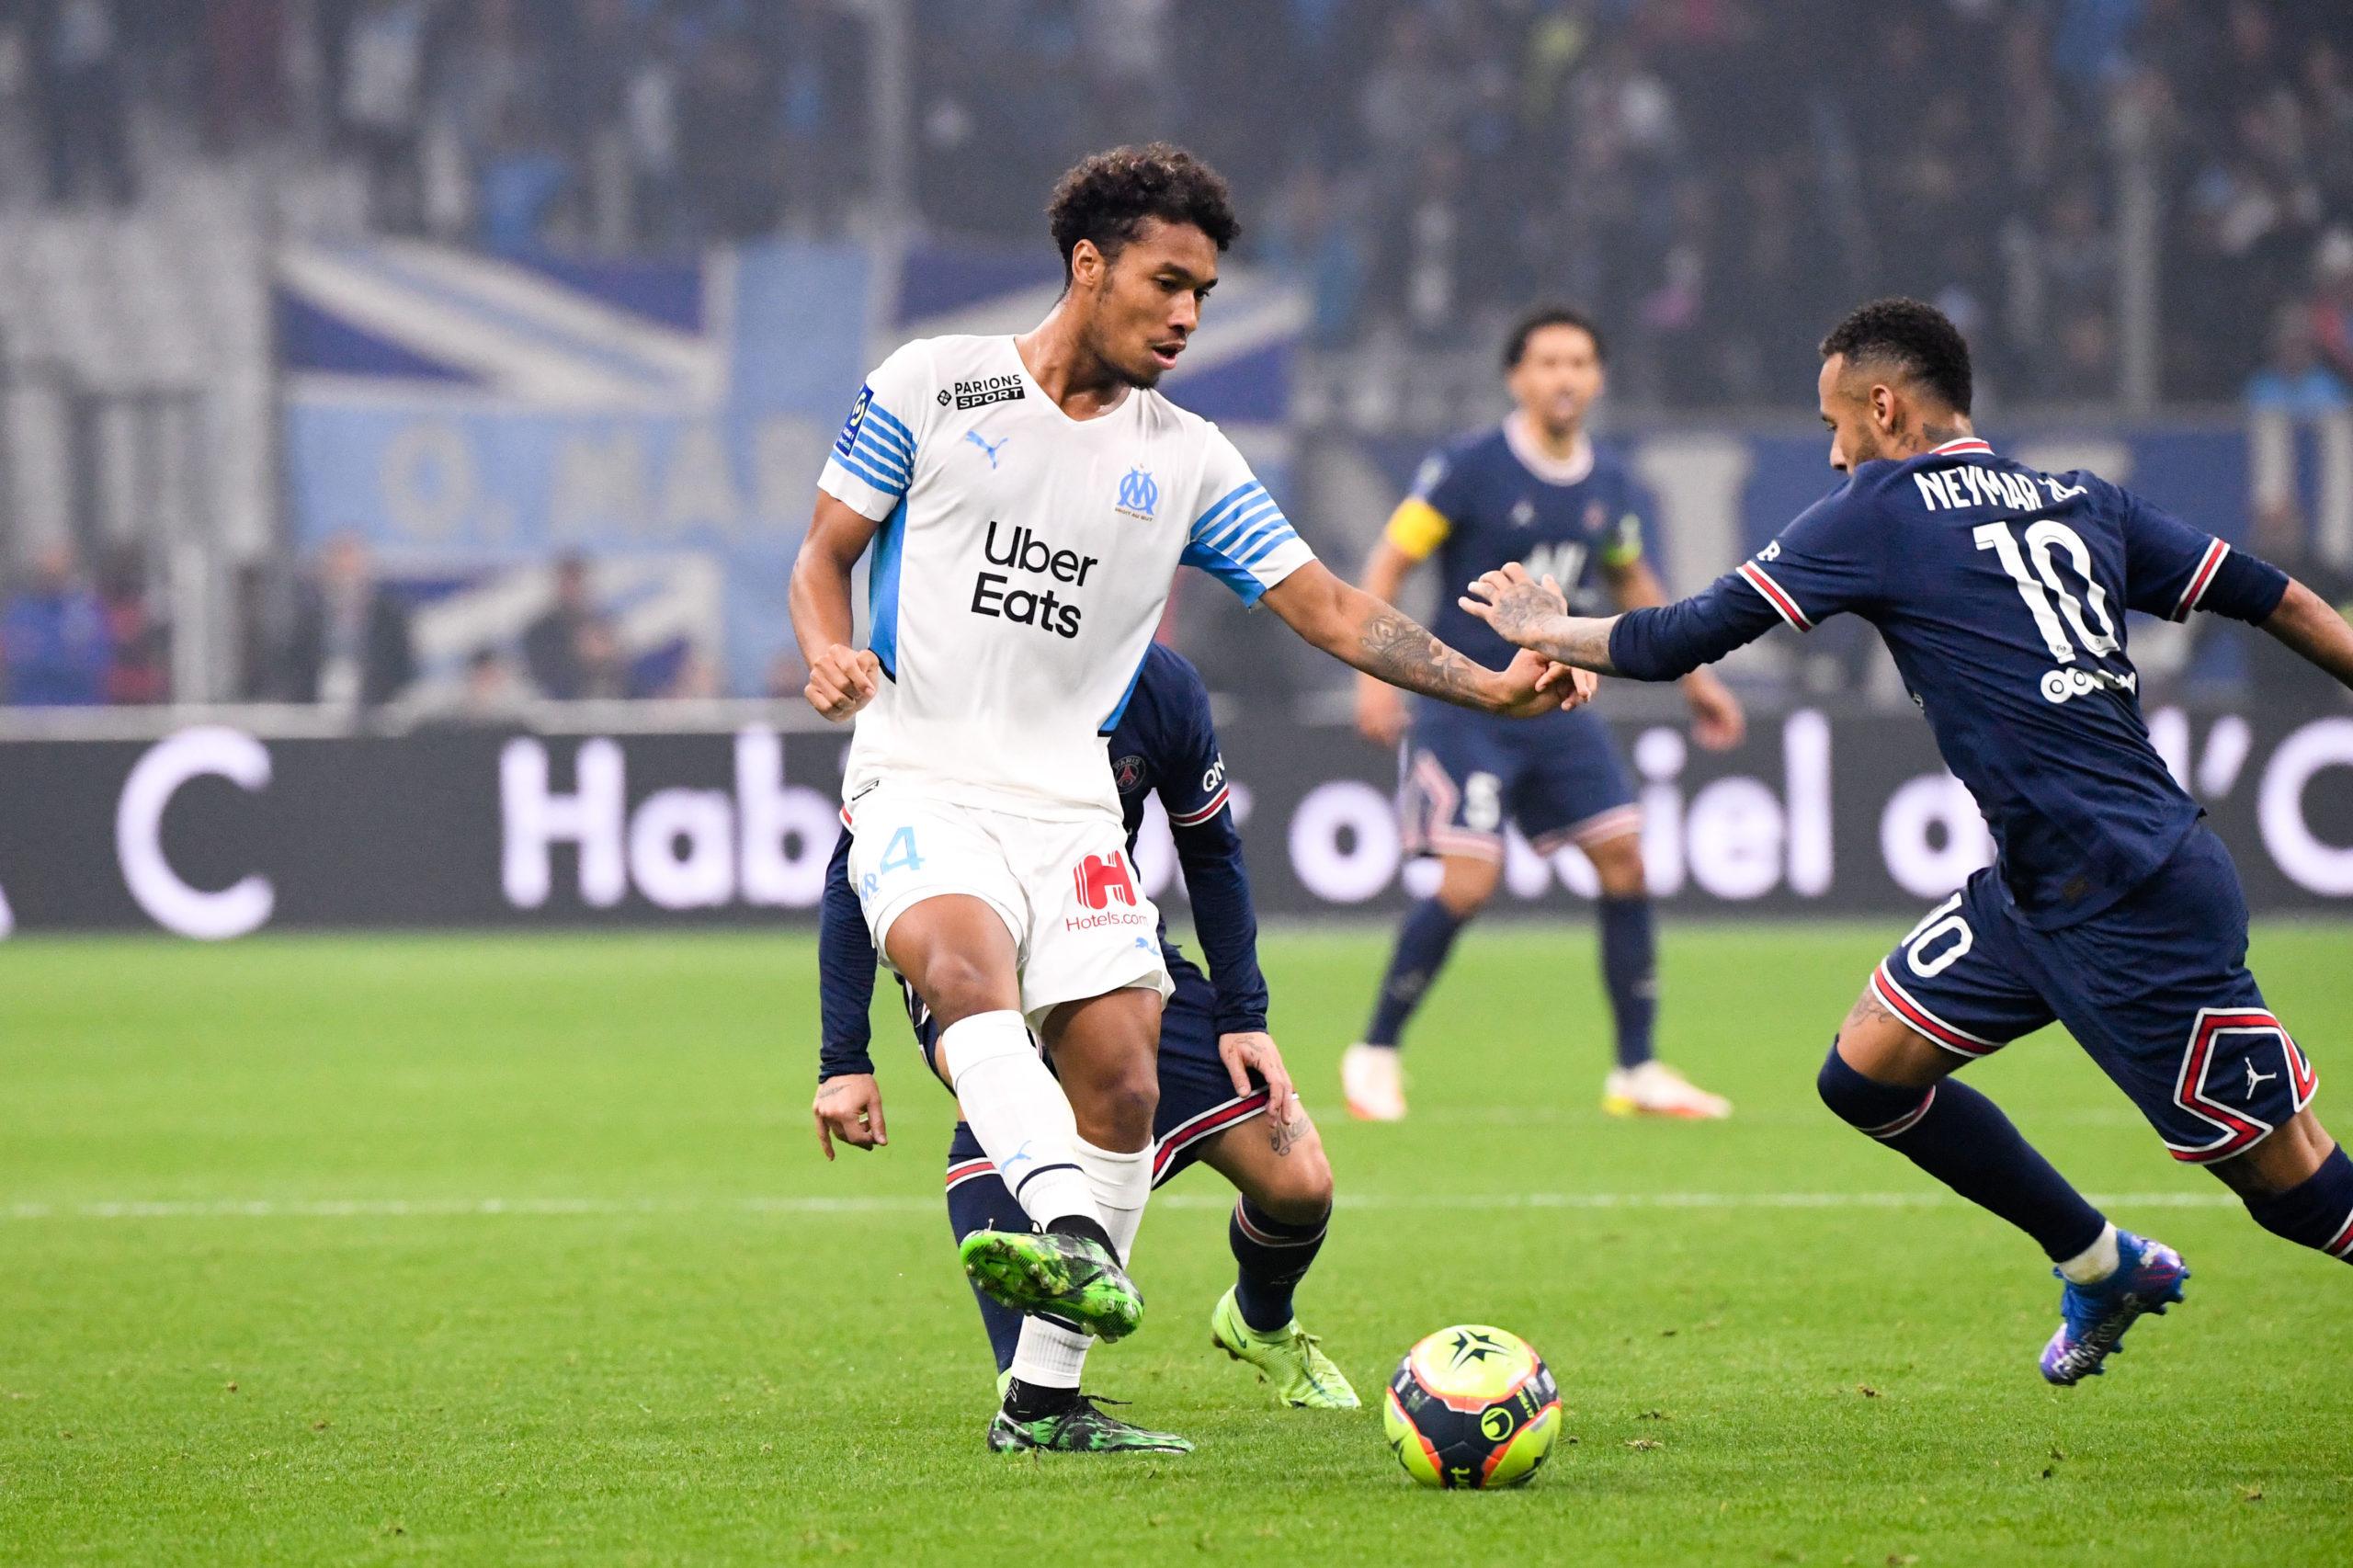 Mercato OM : Kamara au Milan AC en fin de saison, tout est prêt !